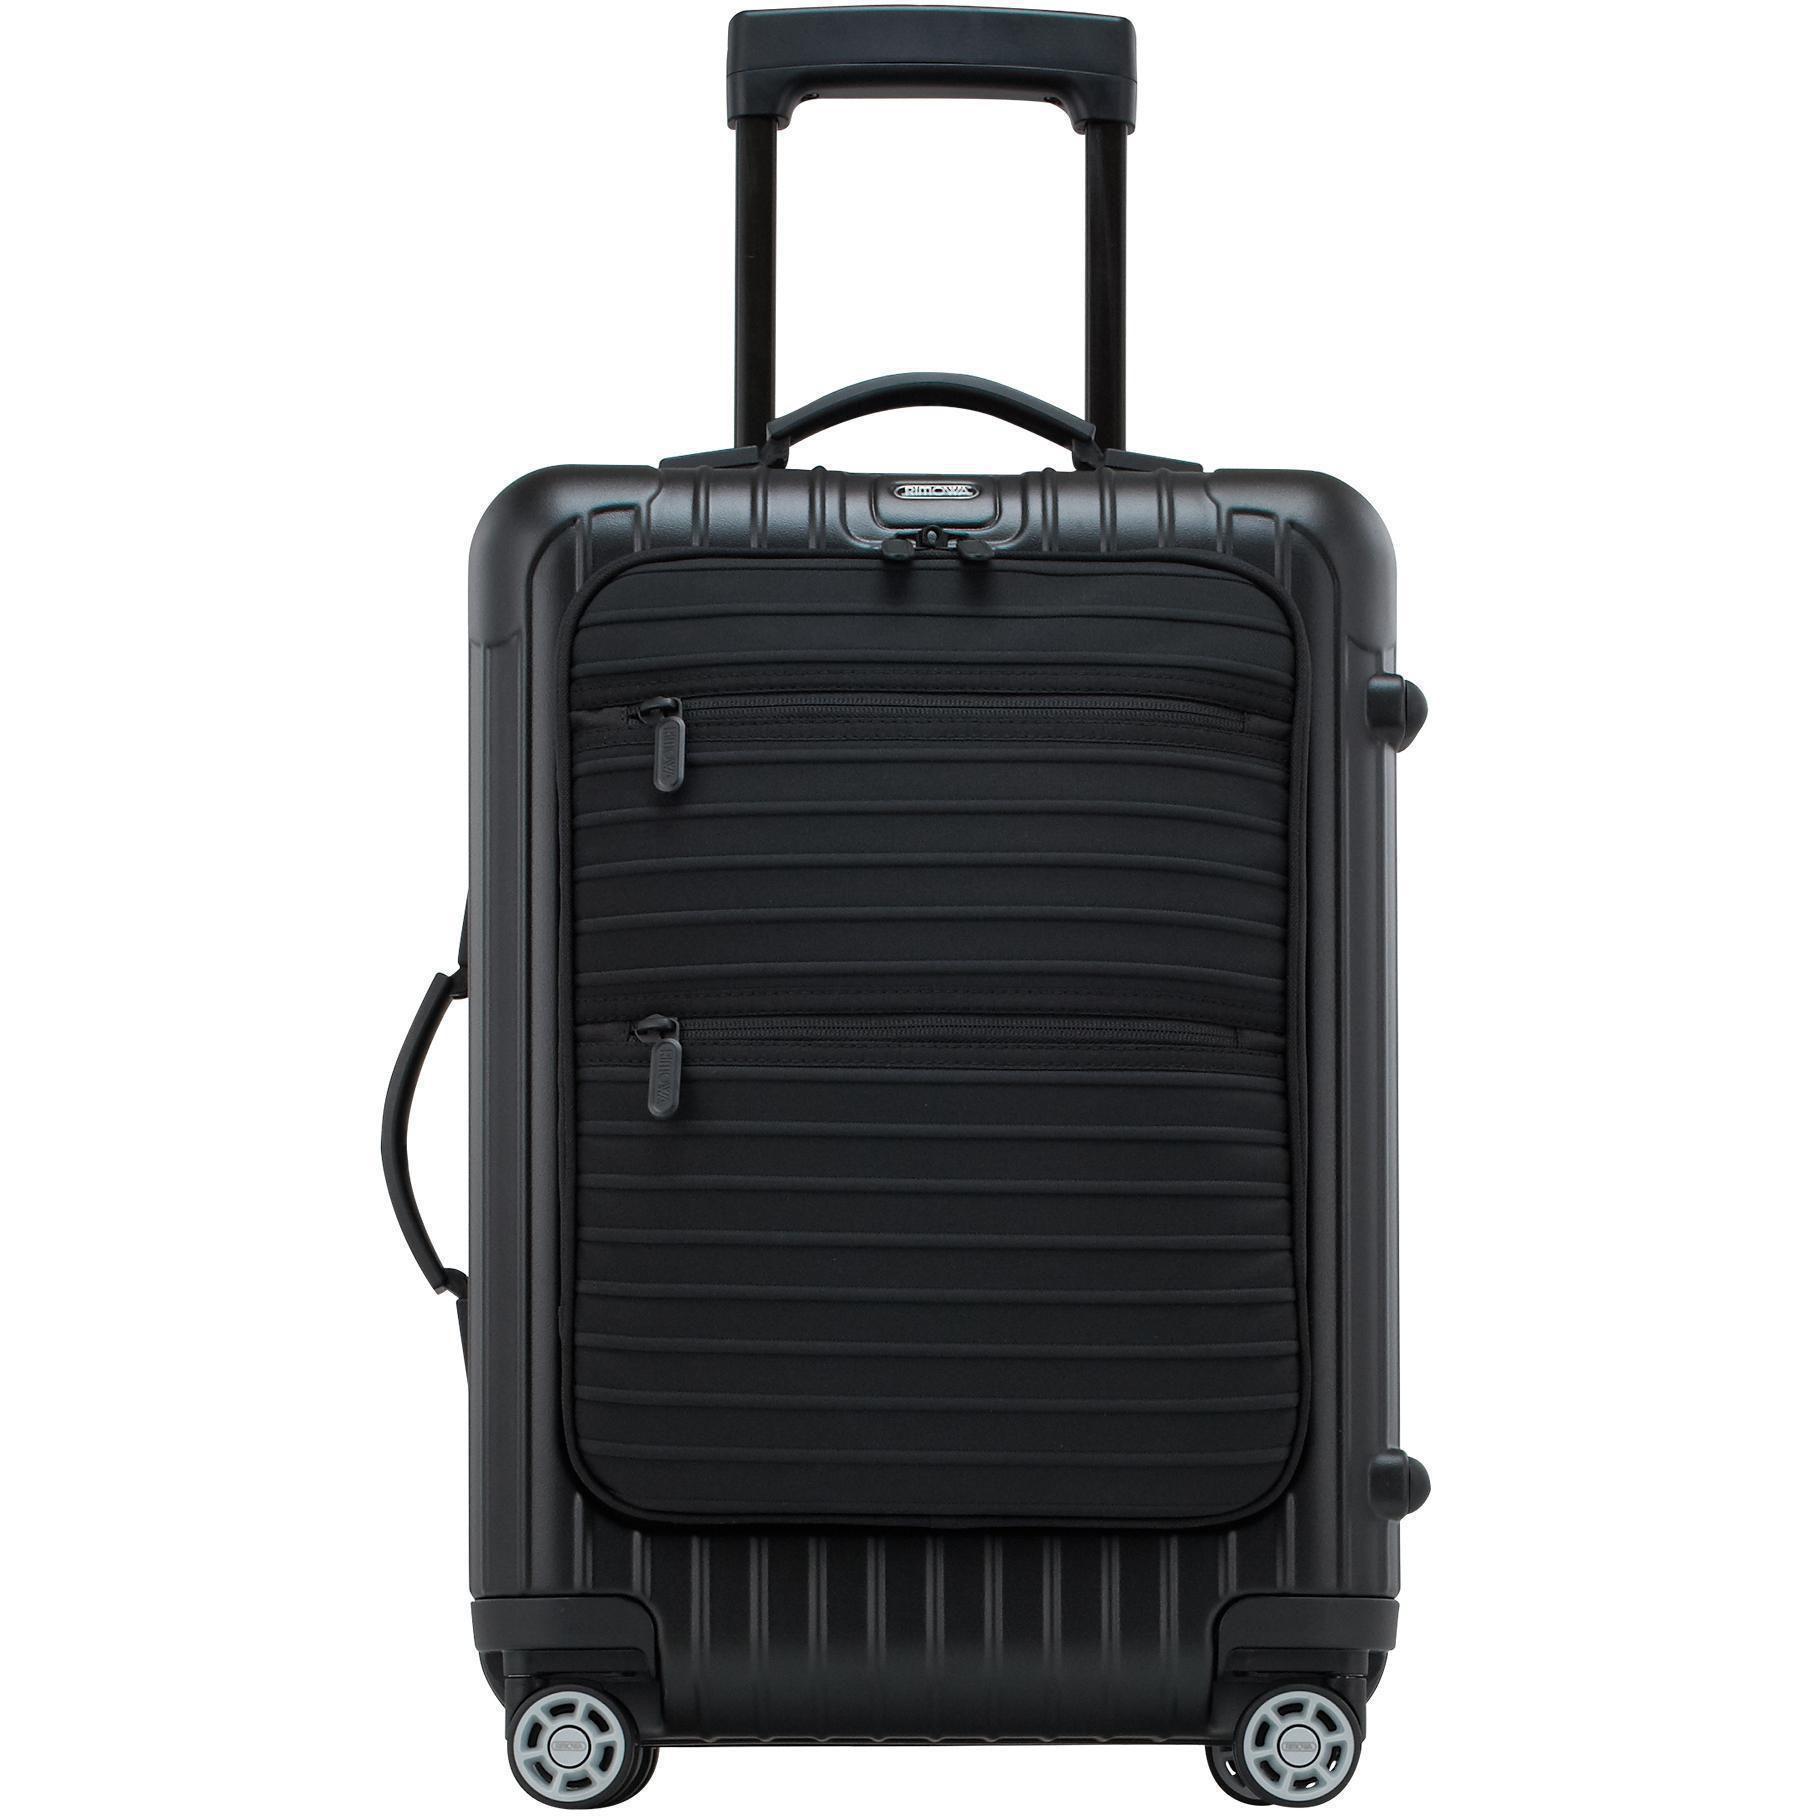 rimowa bolero cabin multiwheel 52 iata kaufen bei. Black Bedroom Furniture Sets. Home Design Ideas